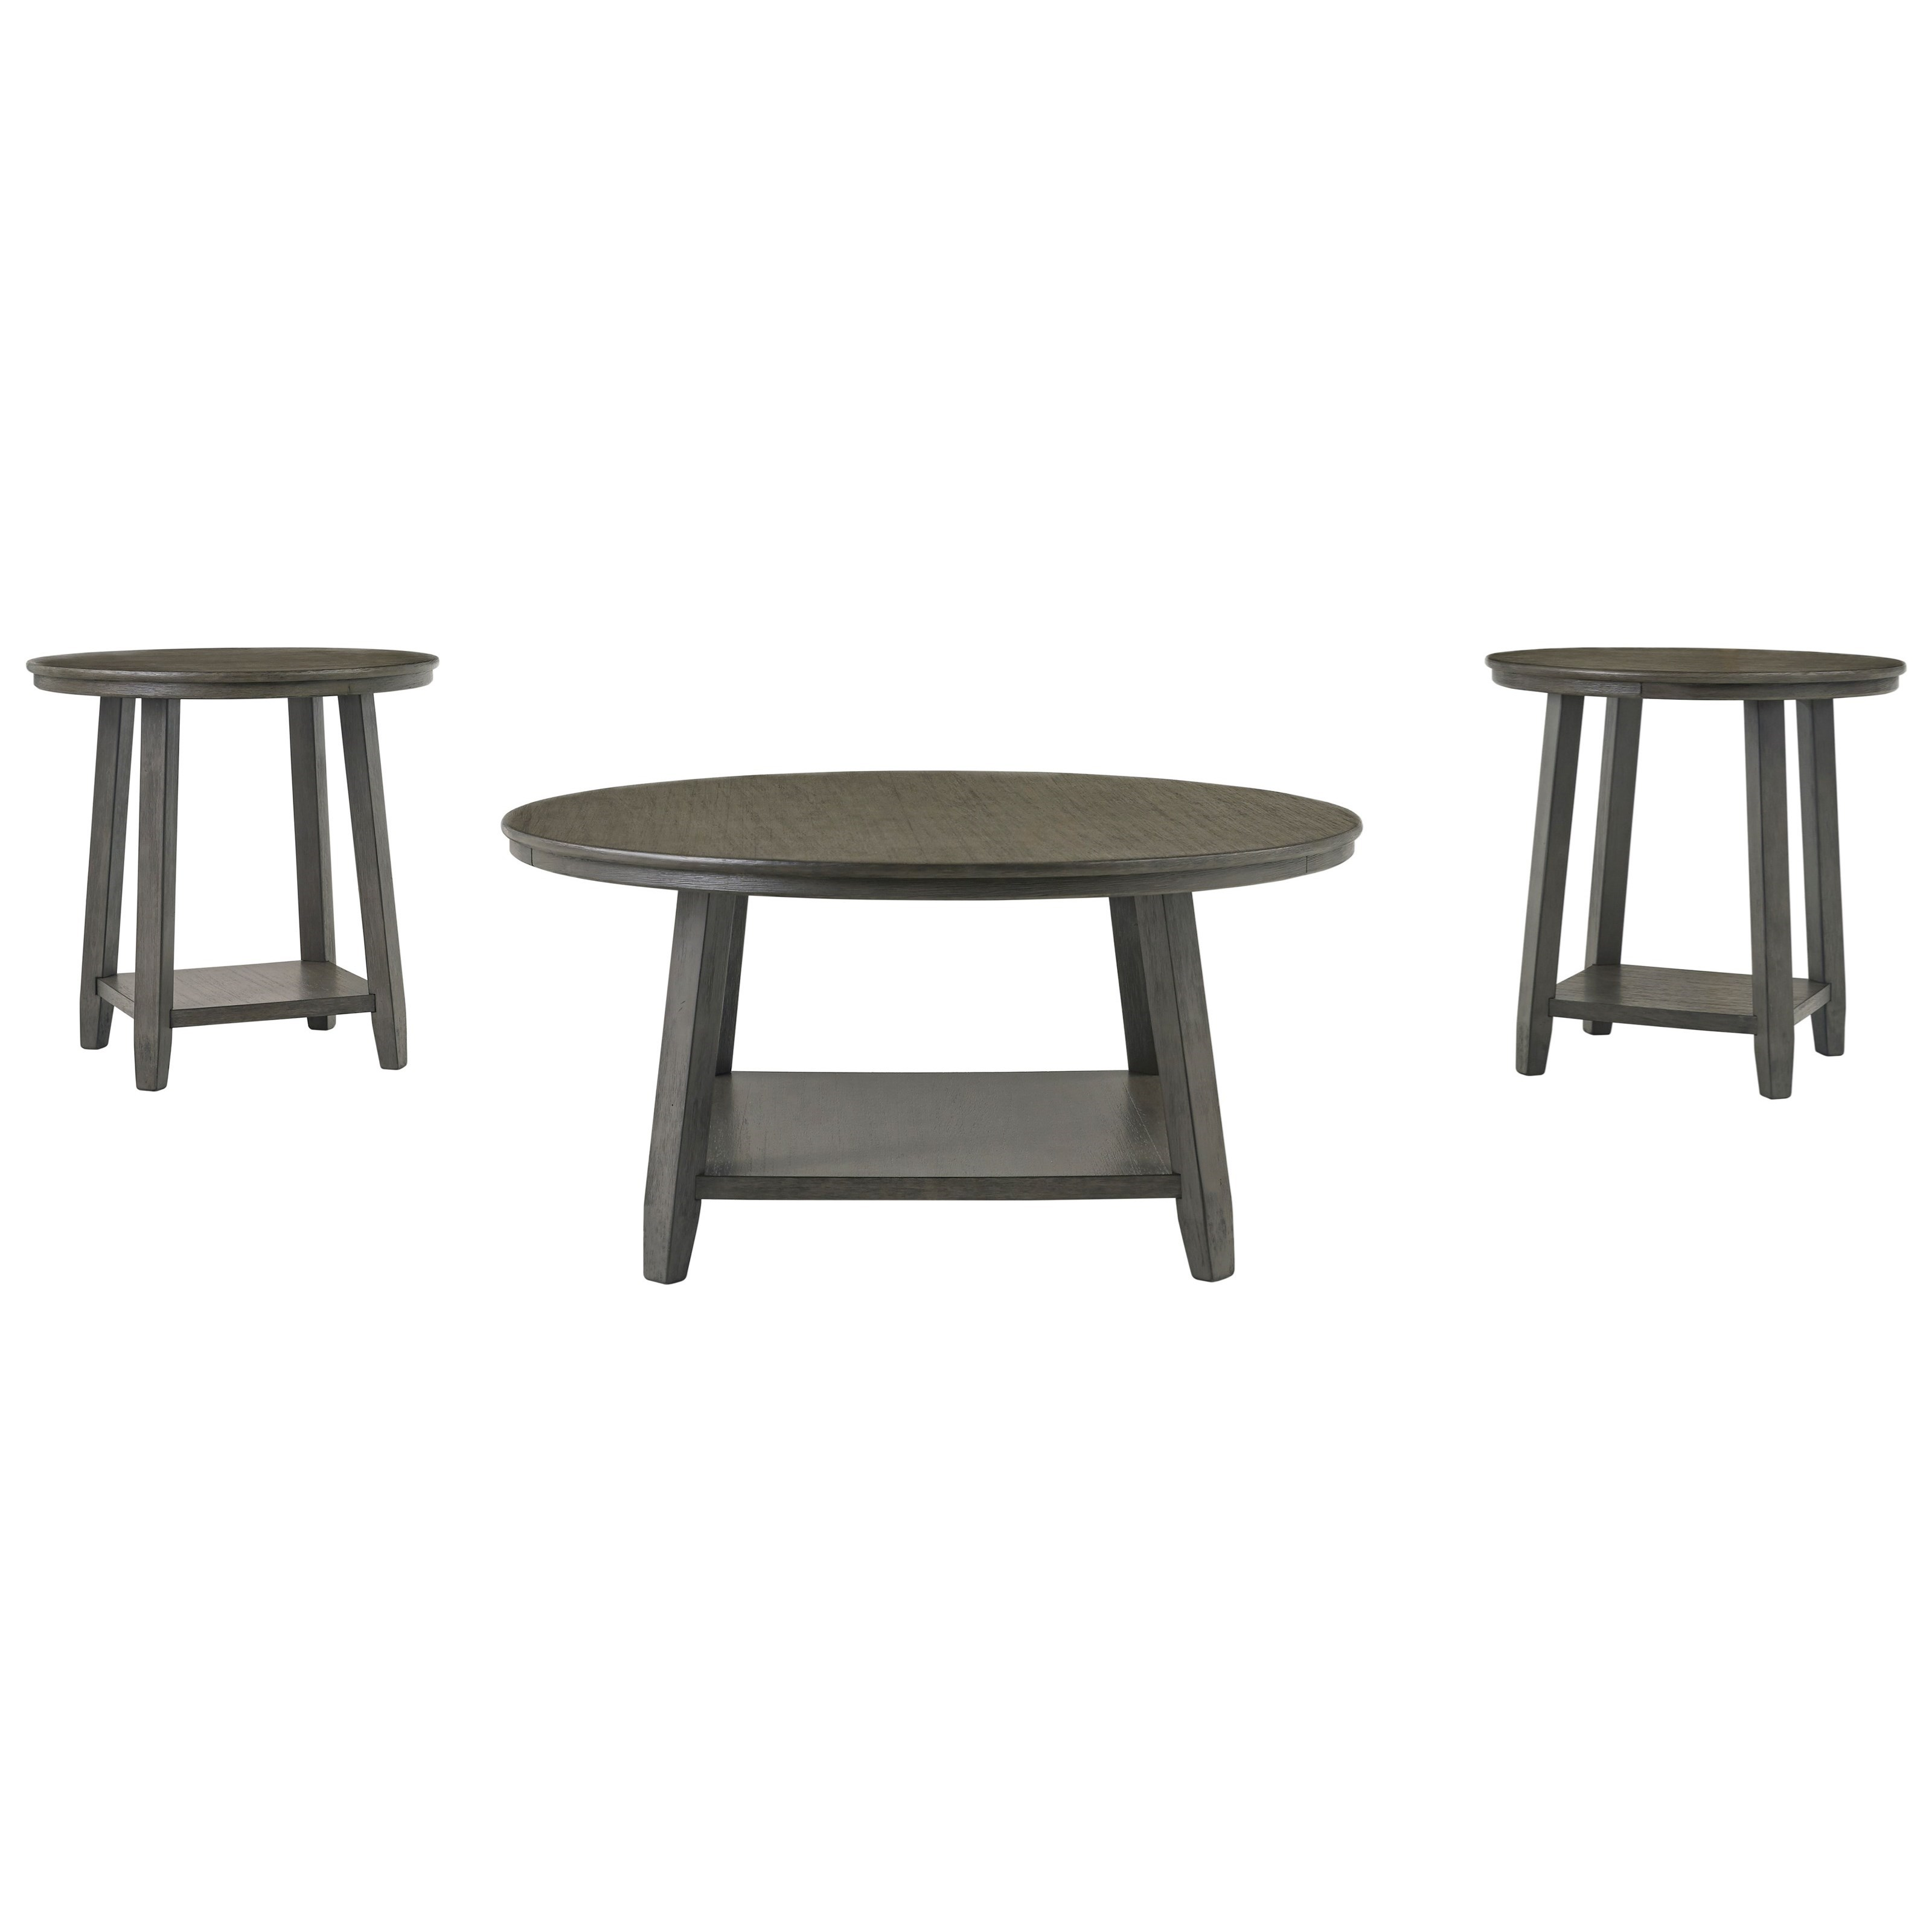 Caitbrook Occasional Table Set by Ashley (Signature Design) at Johnny Janosik